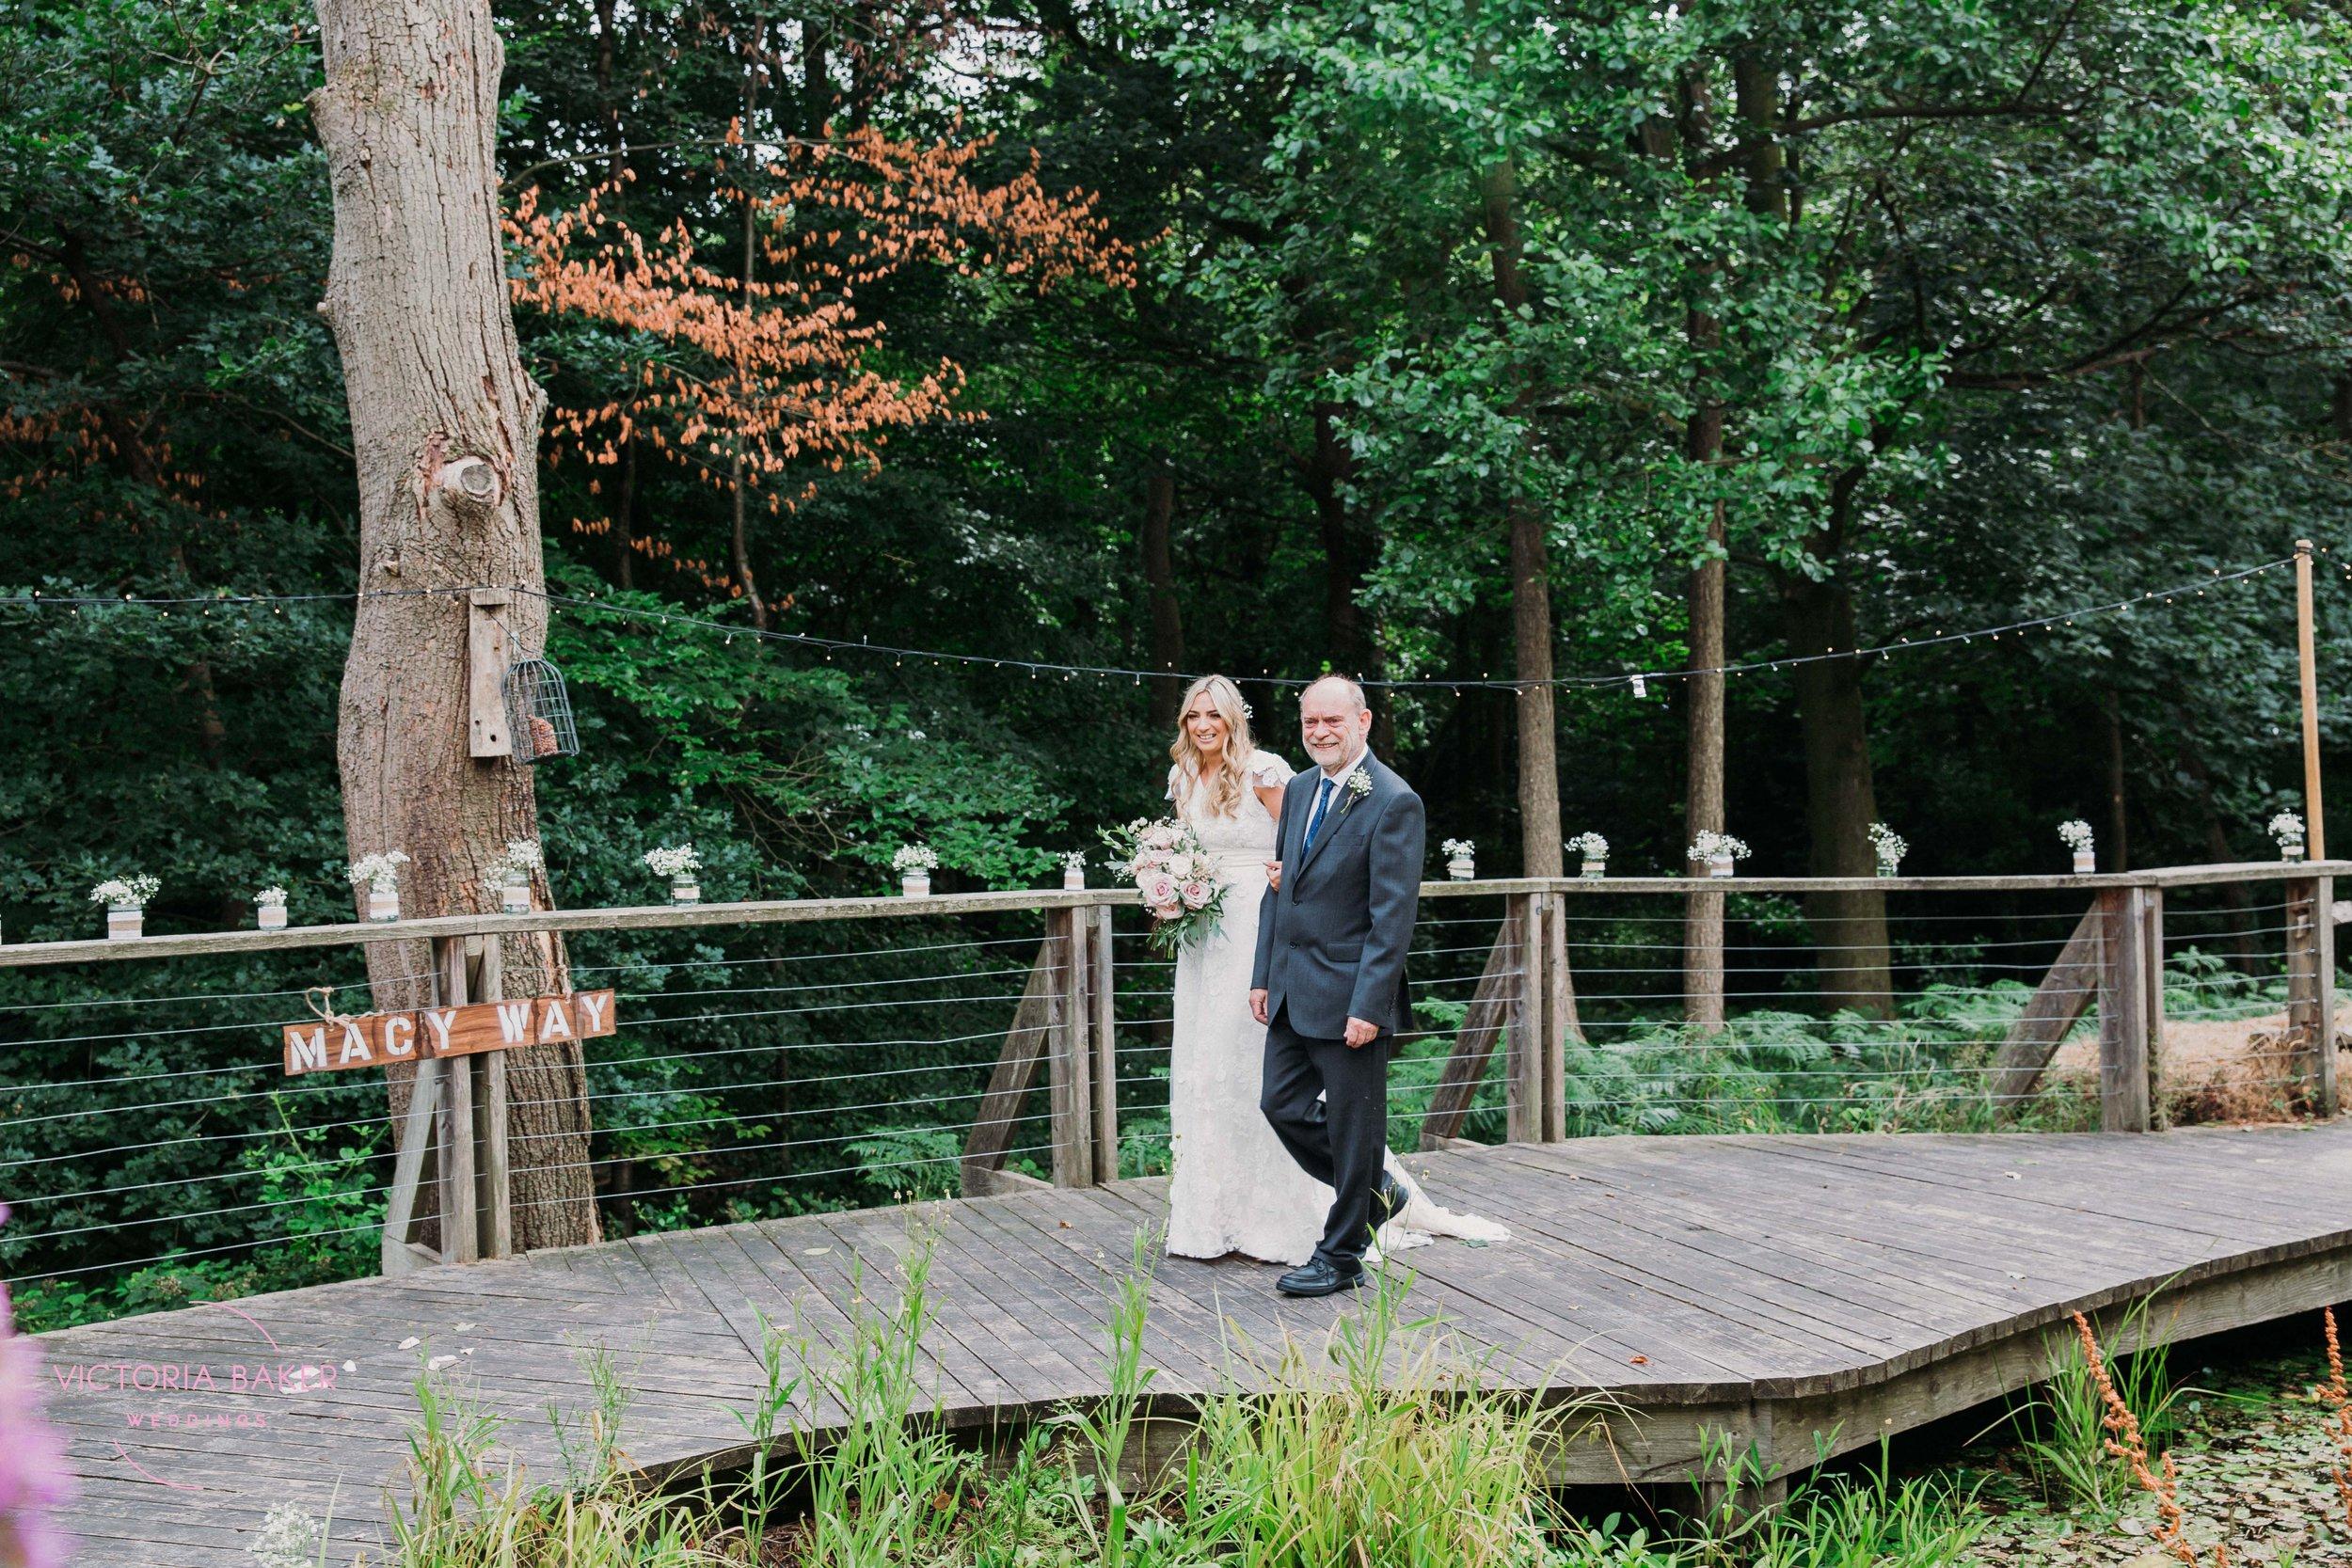 Bride walking down aisle Outdoor Sheffield Wedding